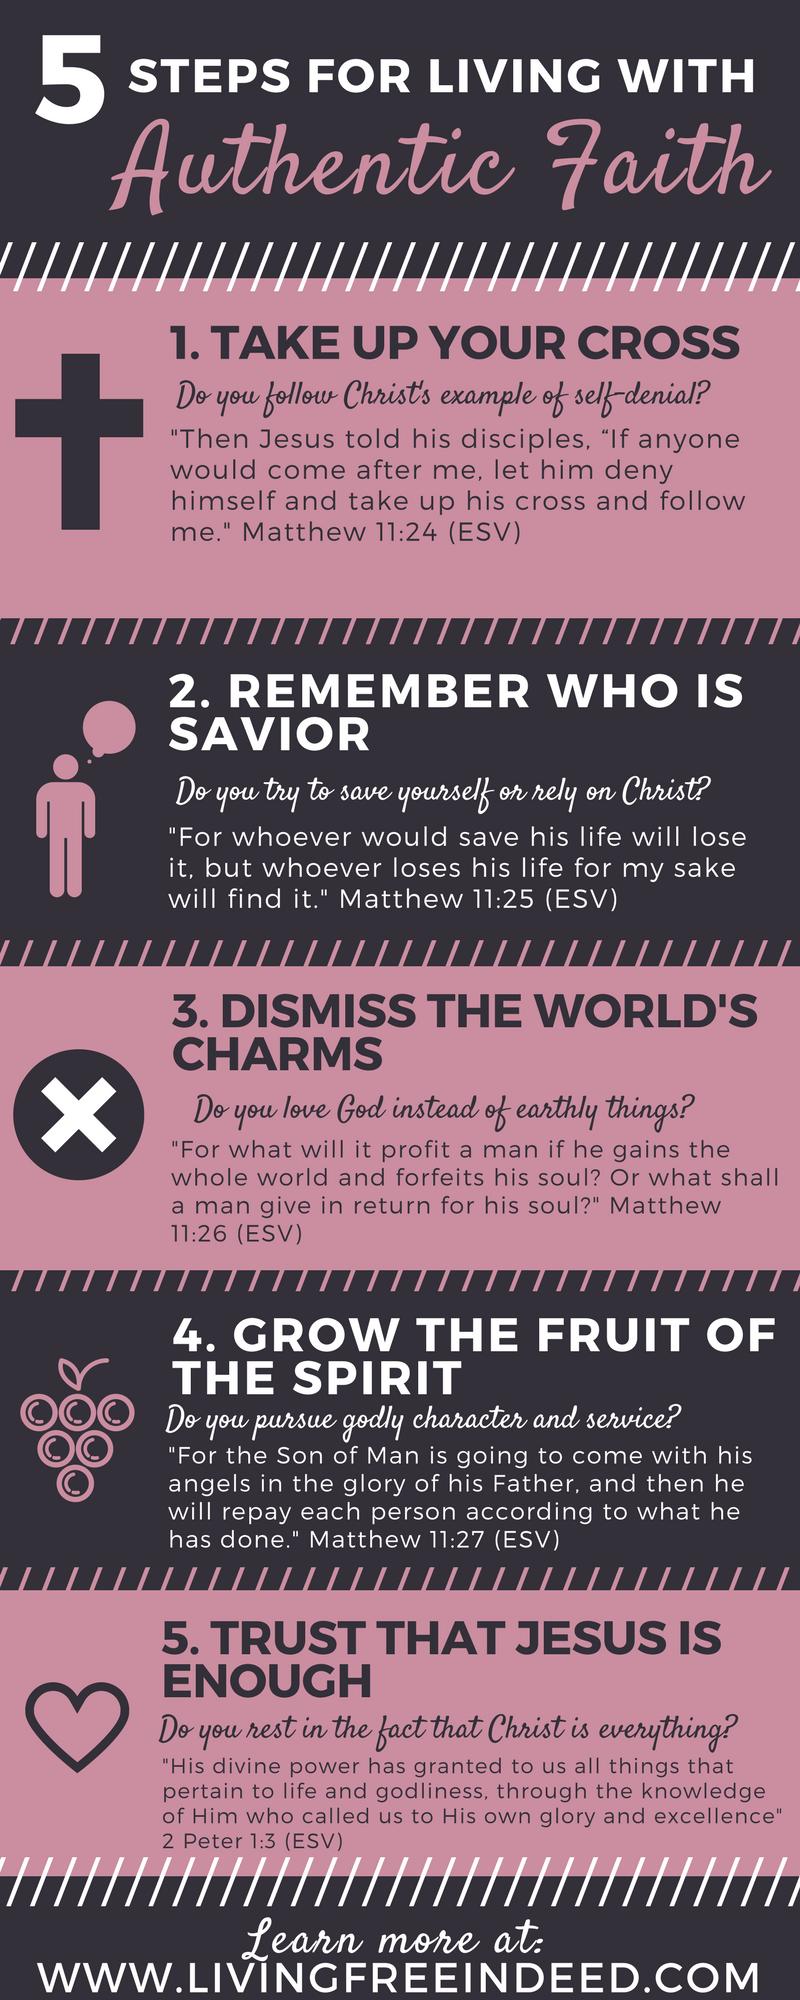 5 Steps for Living with Authentic Faith | Faith, Christian and Bible